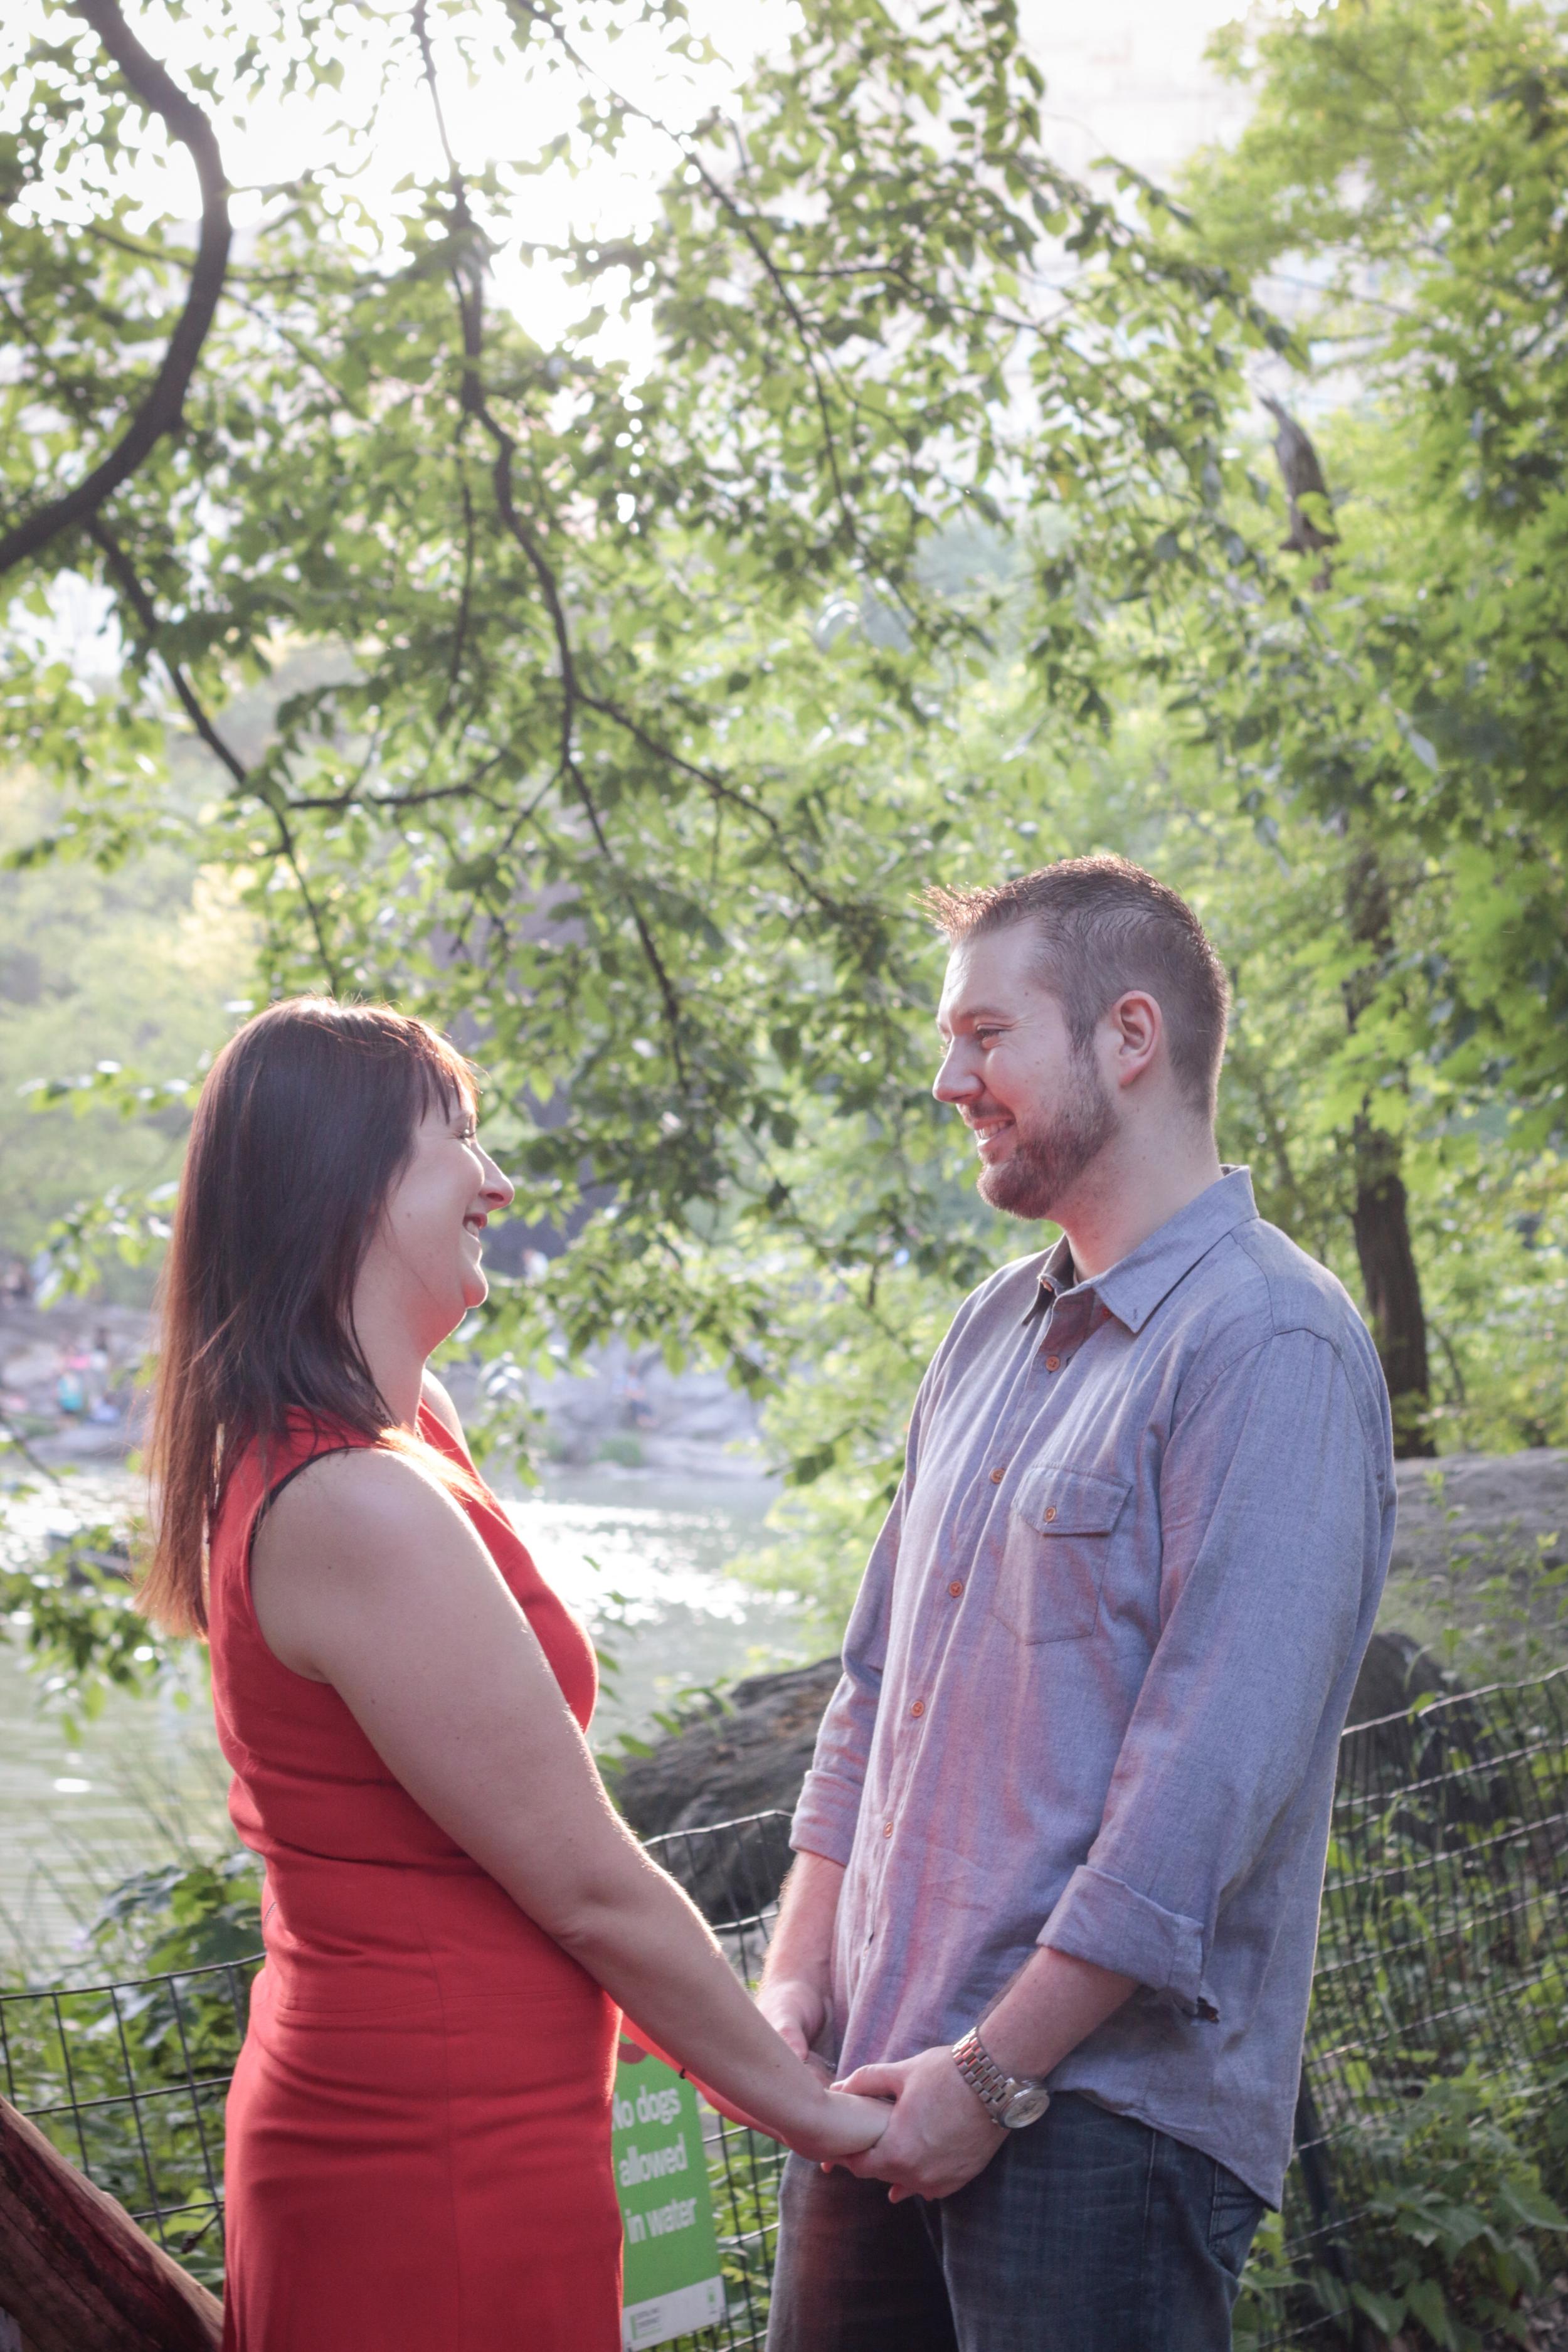 Central Park Engagement Photos - The Ramble